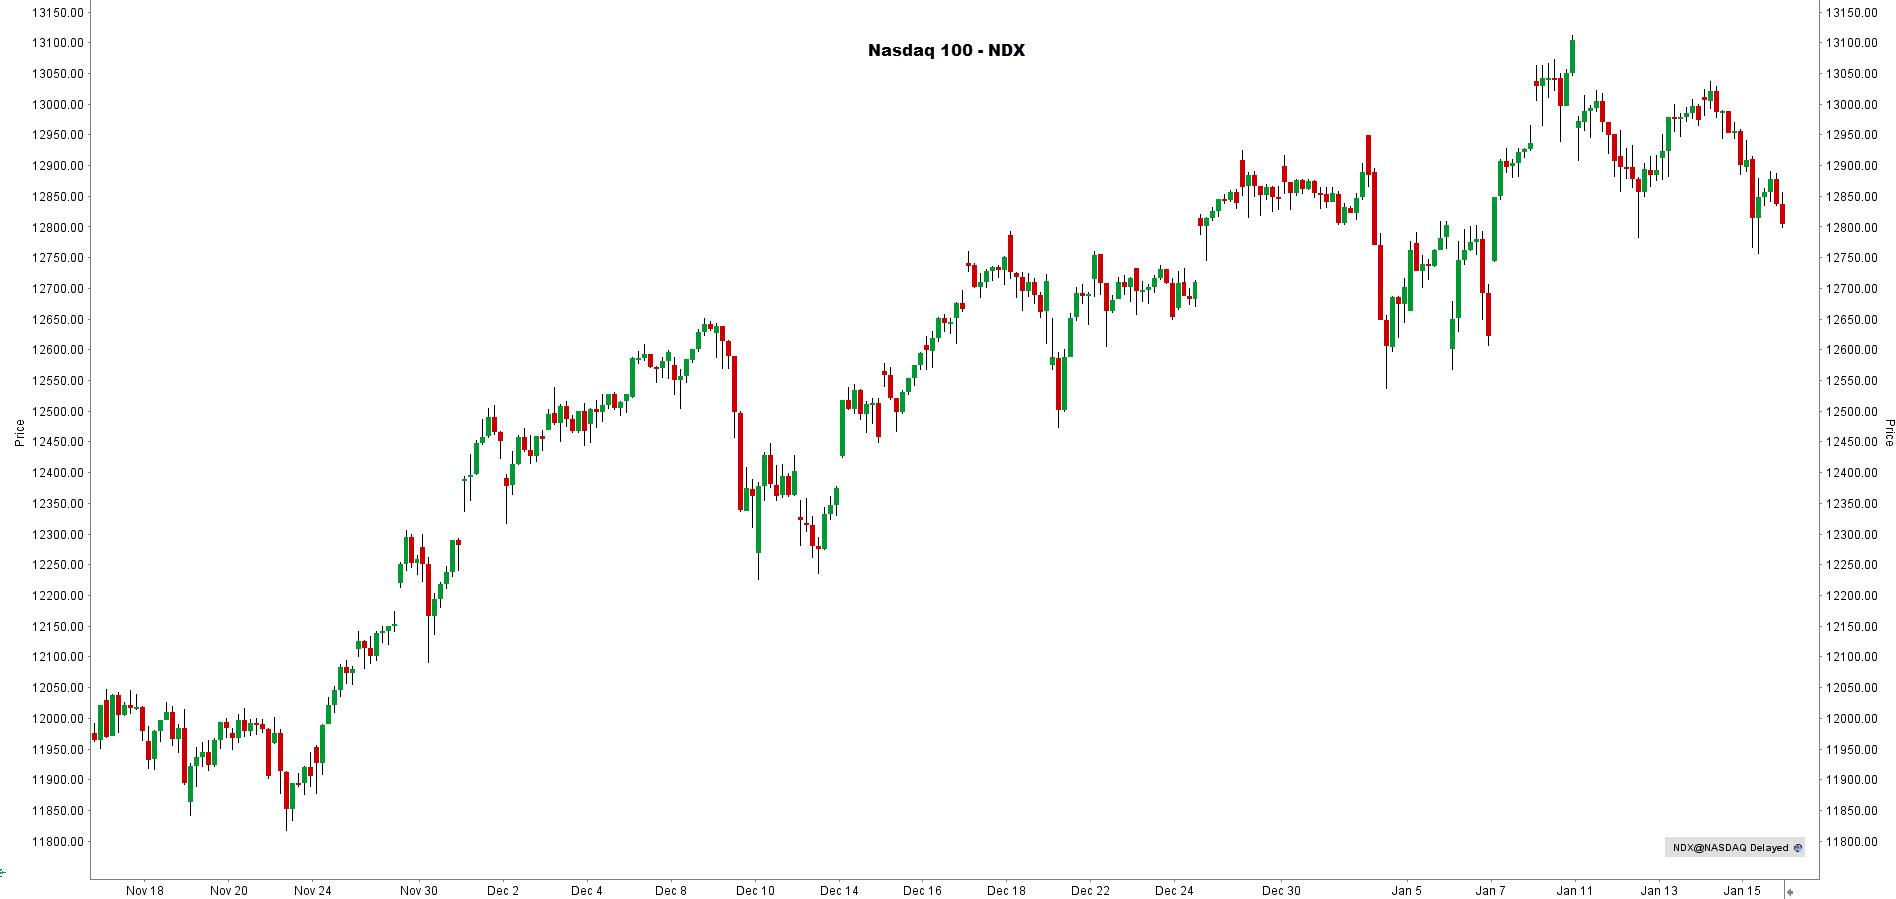 la chronique lynx broker 190121 - graphique NASDAQ